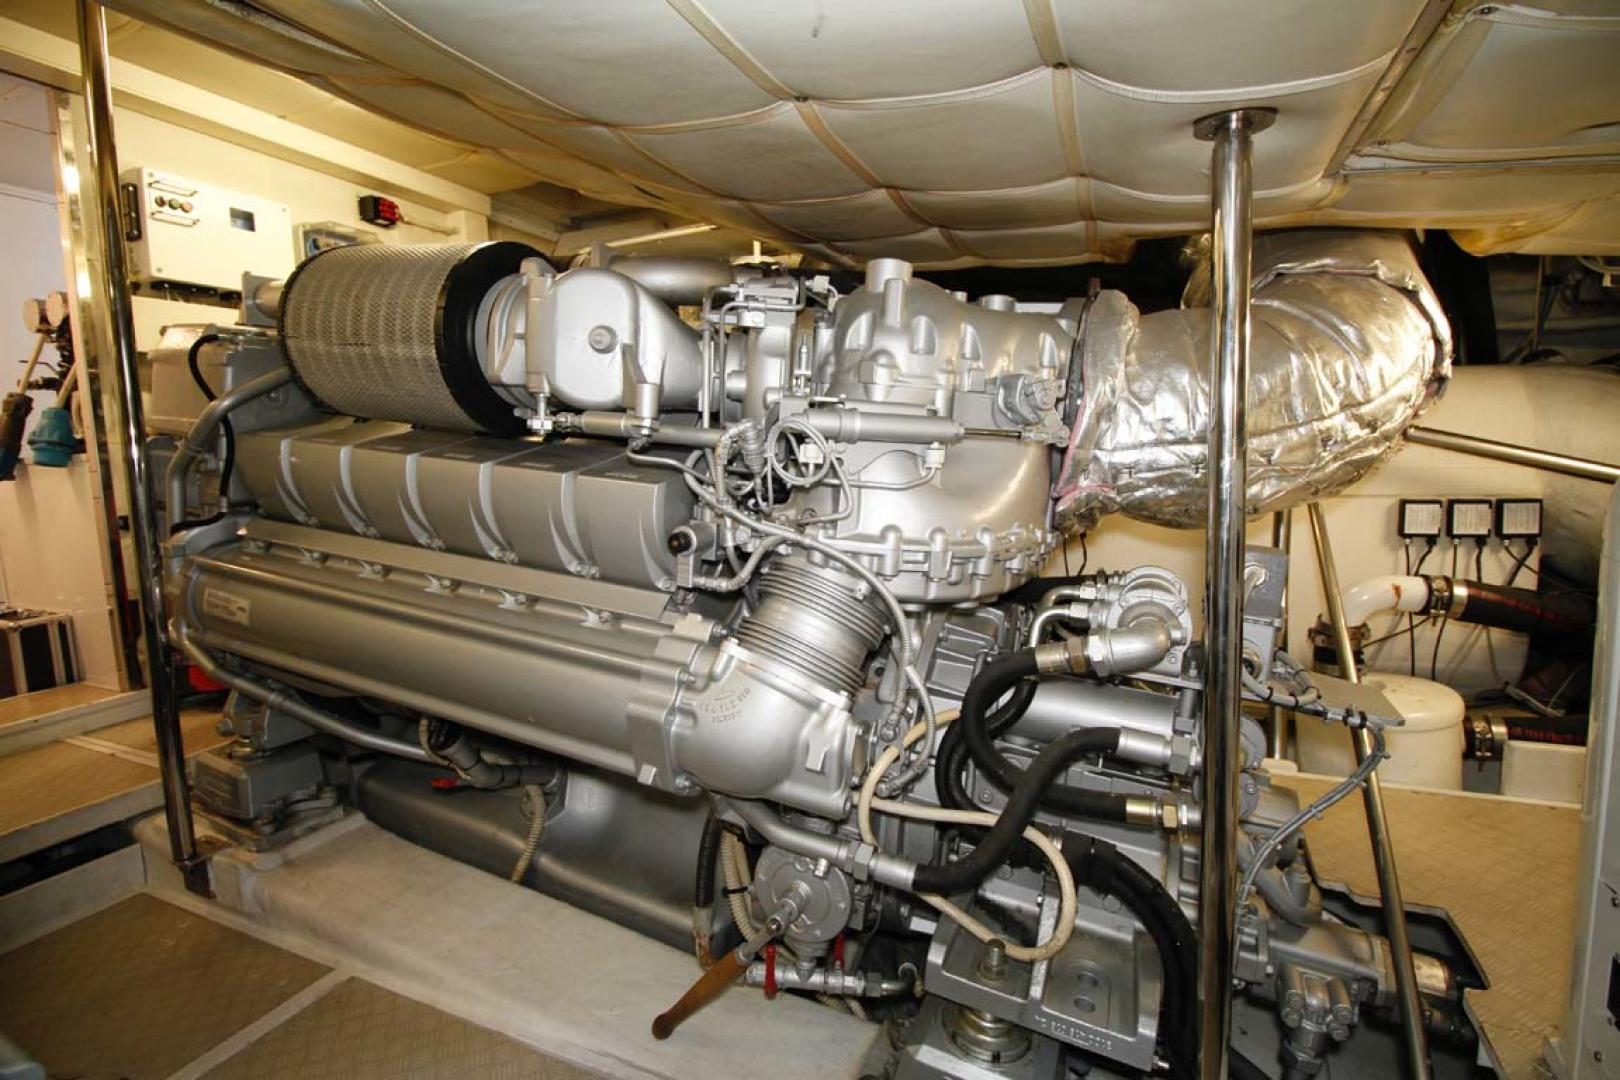 Pershing-P-72 2008-Intrepido Aventura-Florida-United States-Engine Room-1163075 | Thumbnail